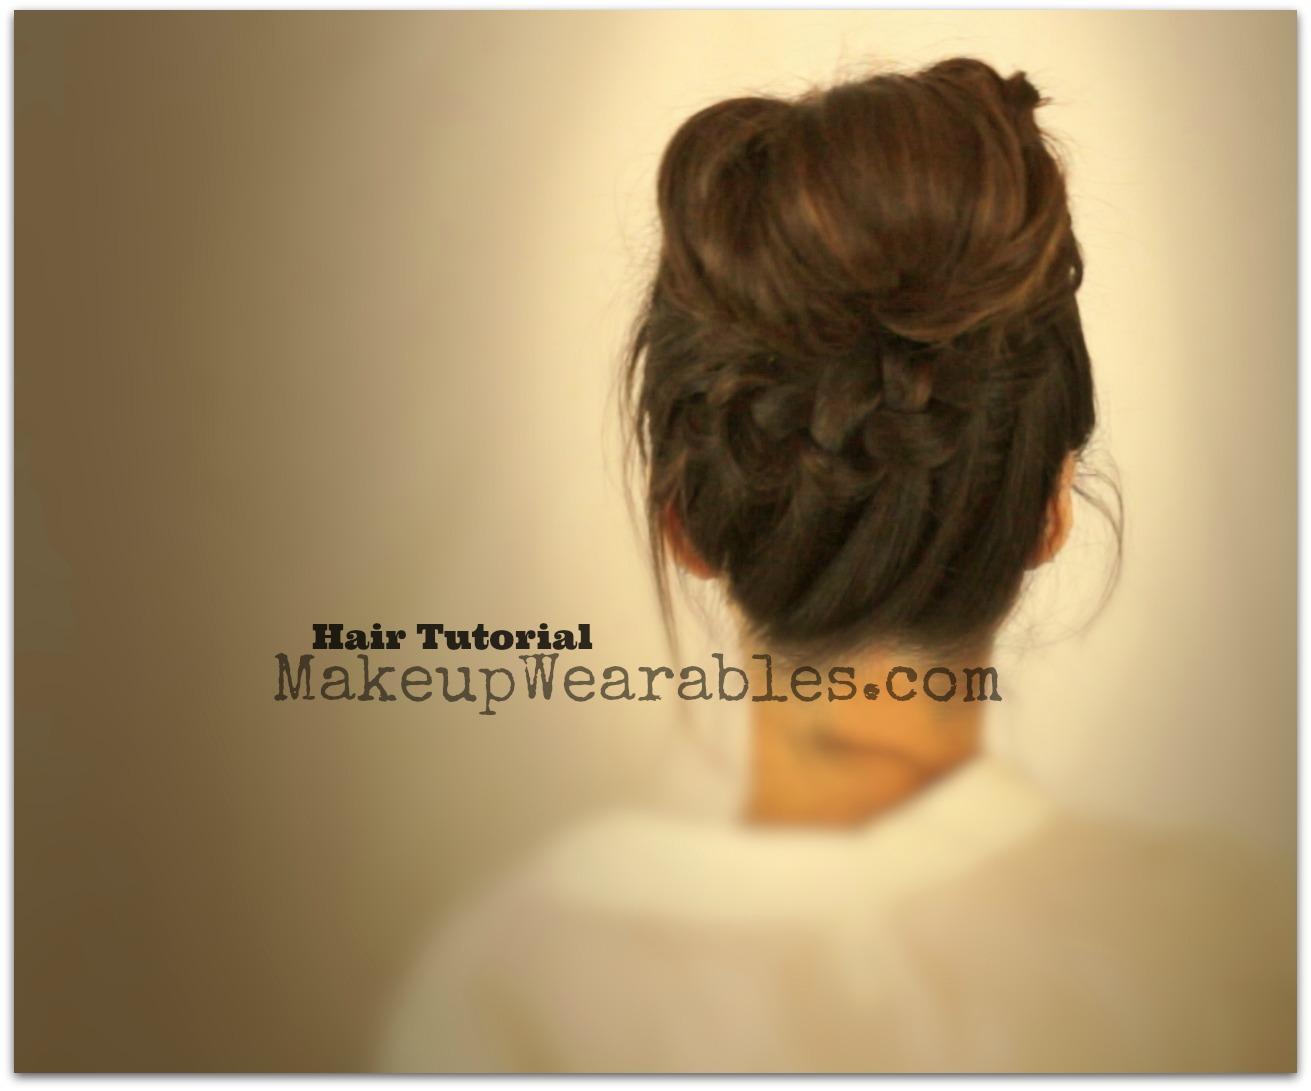 Surprising Learn 3 Cute Everyday Casual Hairstyles Updos Hair Tutorial Videos Short Hairstyles Gunalazisus